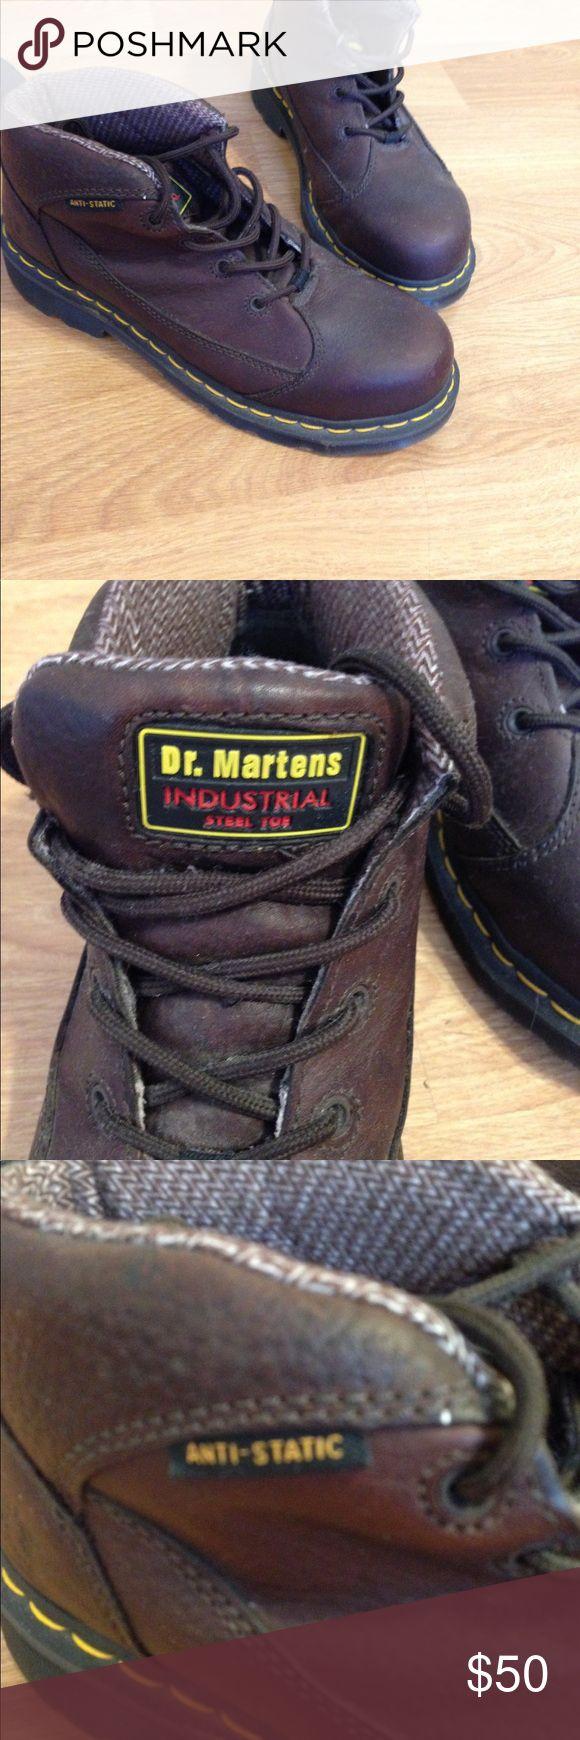 Dr Martens Steel Toe Women's Work Boots Women's leather steel toe work boots. Only worn twice. Dr. Martens Shoes Ankle Boots & Booties